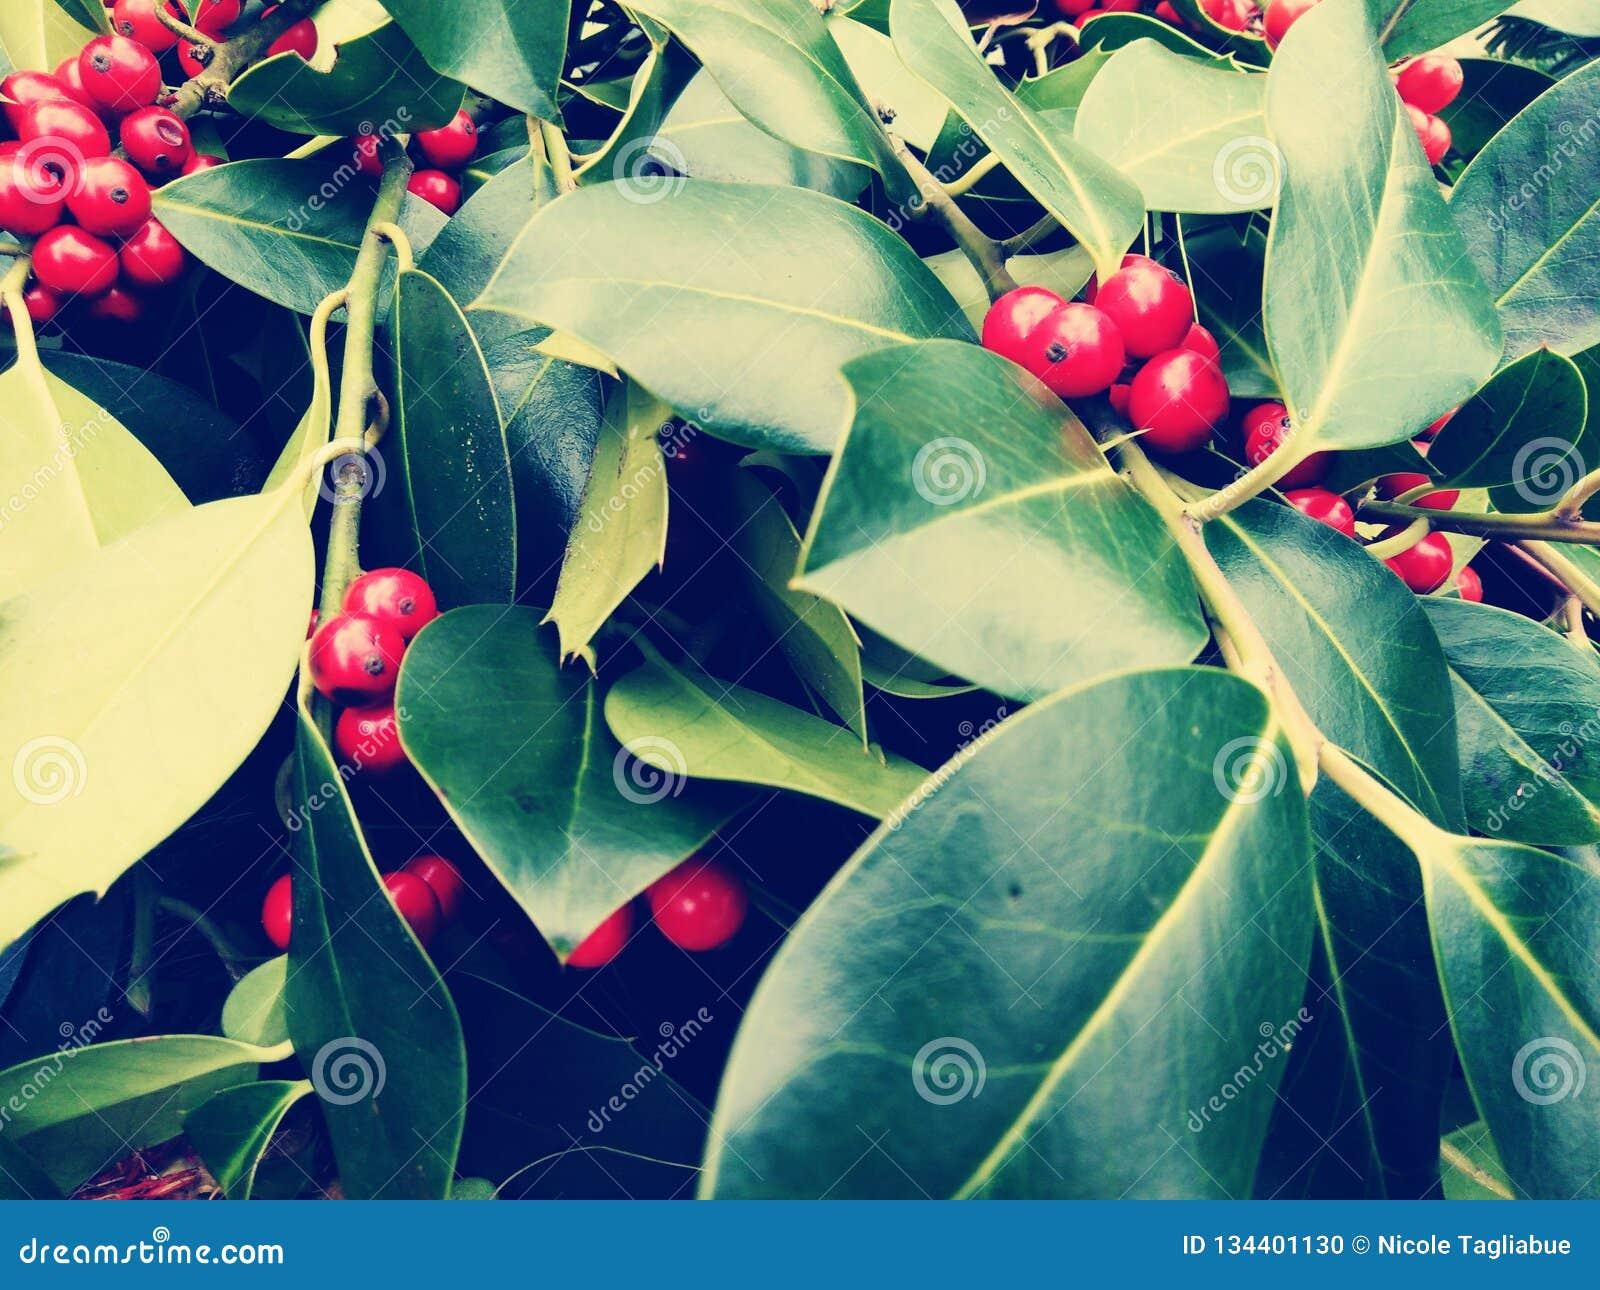 Closeup on Christmas bay tree red berries - Vintage retro Christmas concept